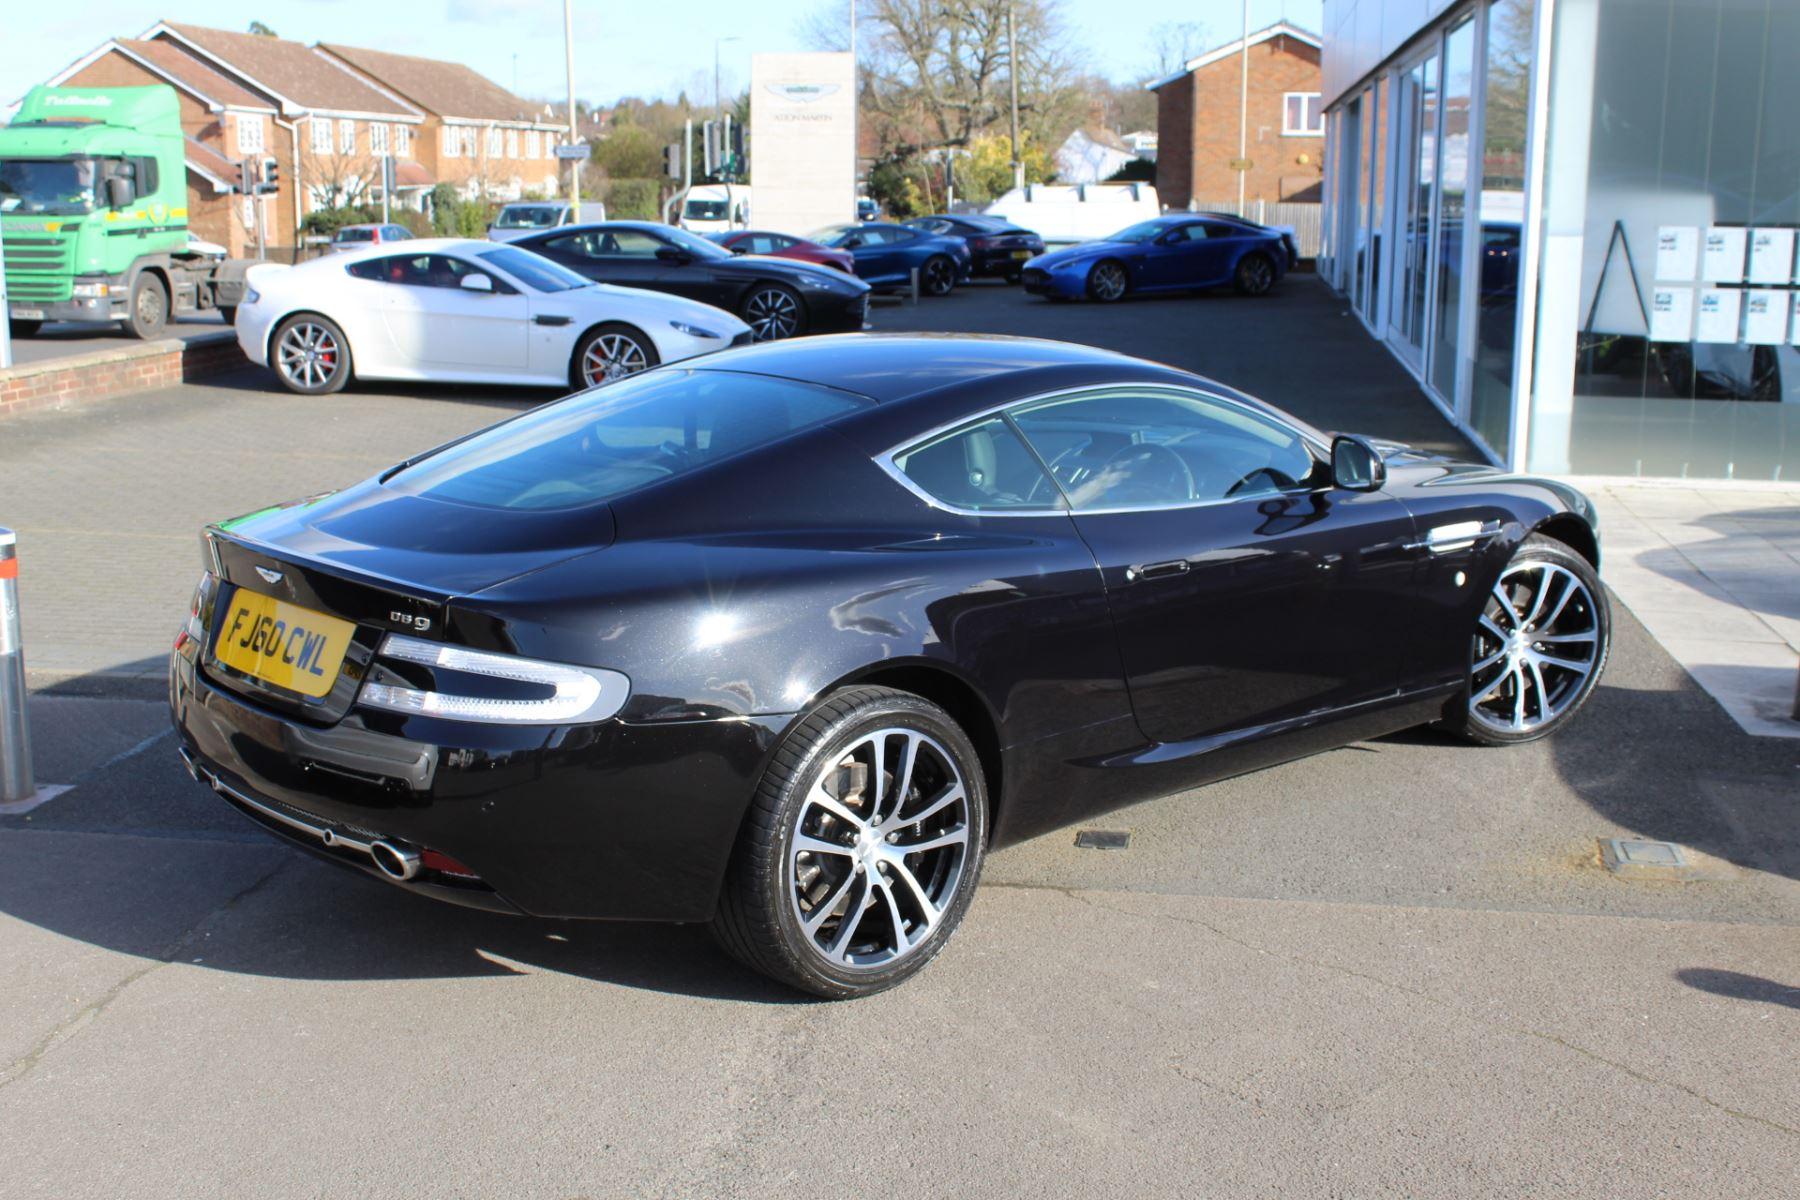 Aston Martin DB9 V12 2dr Touchtronic [470] image 16